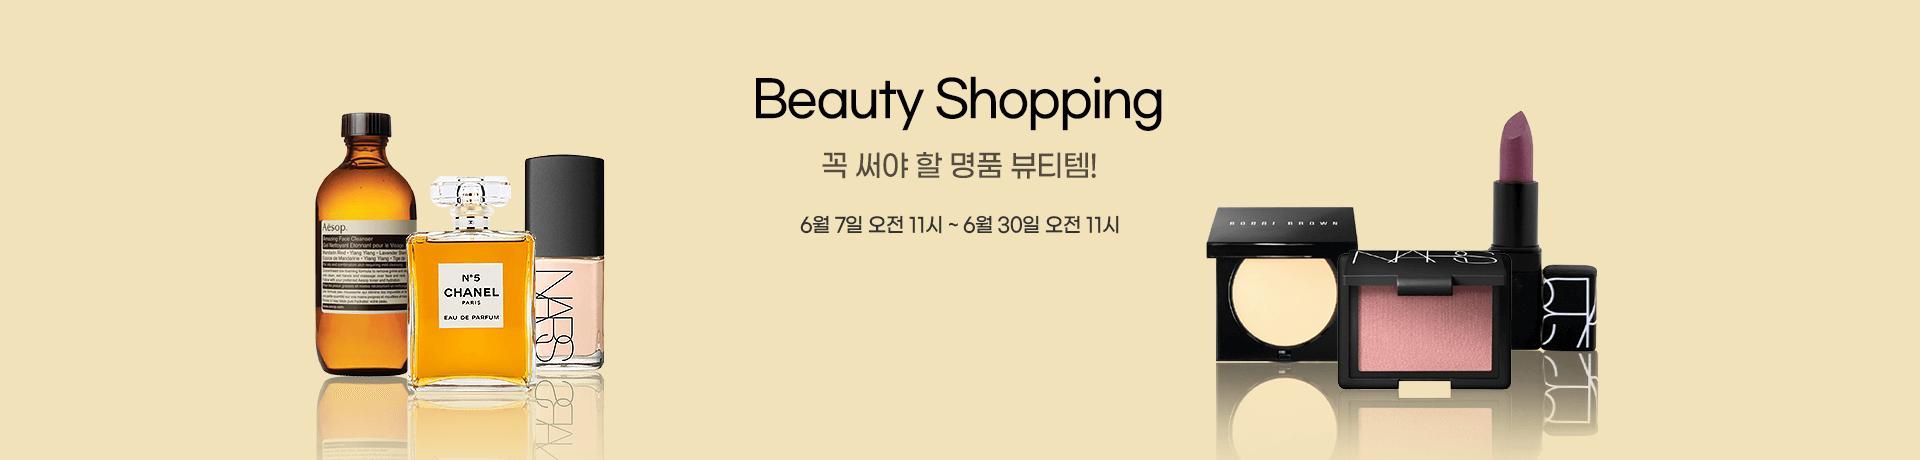 210607_yh_beauty-shopping_pc_f2e2ba